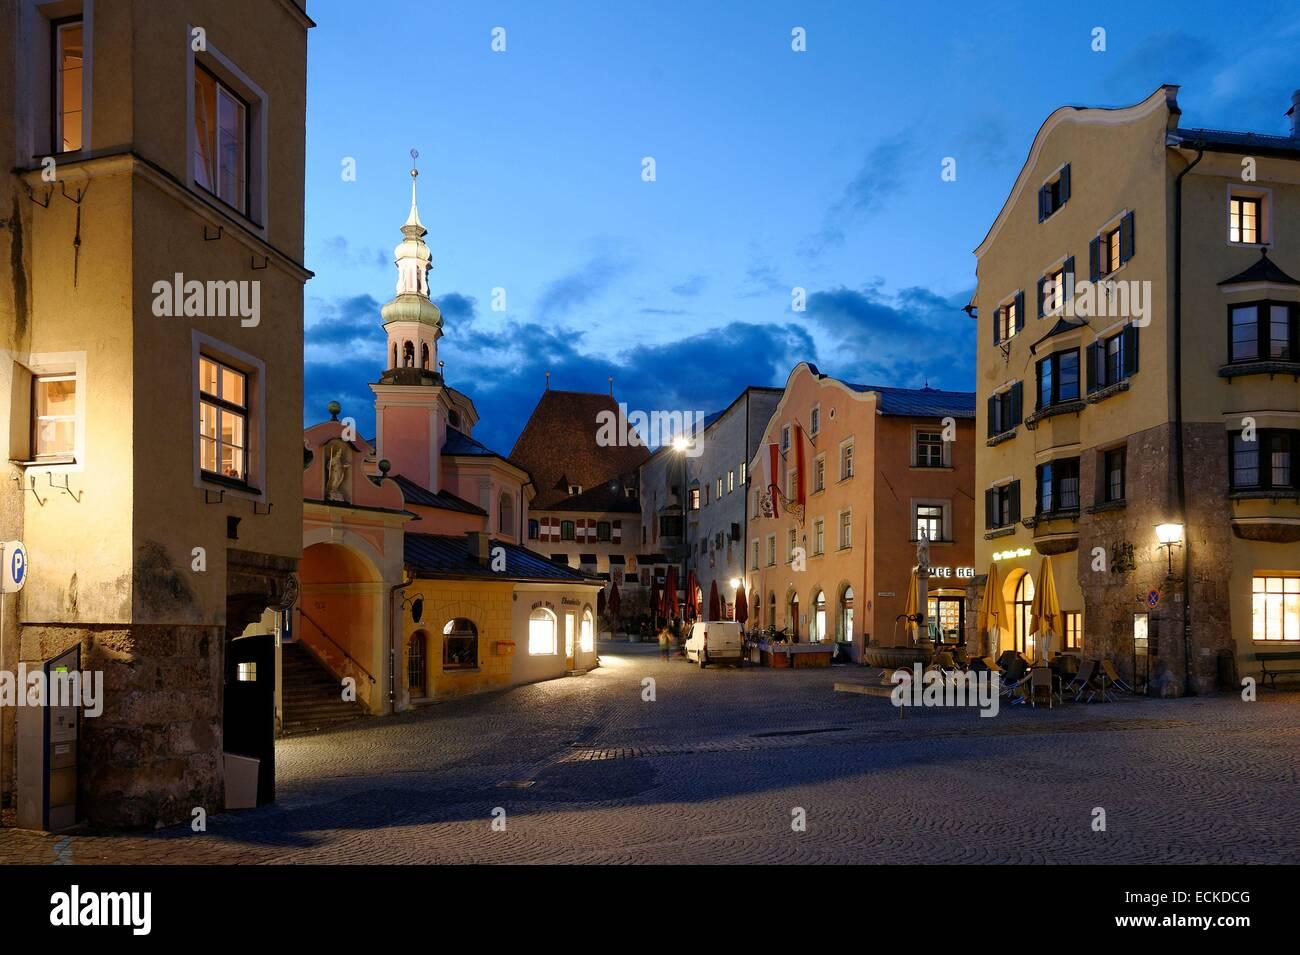 Austria, Tyrol, Hall in Tirol, medieval city, the parish church St Nicolas's Stadtpfarrkirche on the central - Stock Image